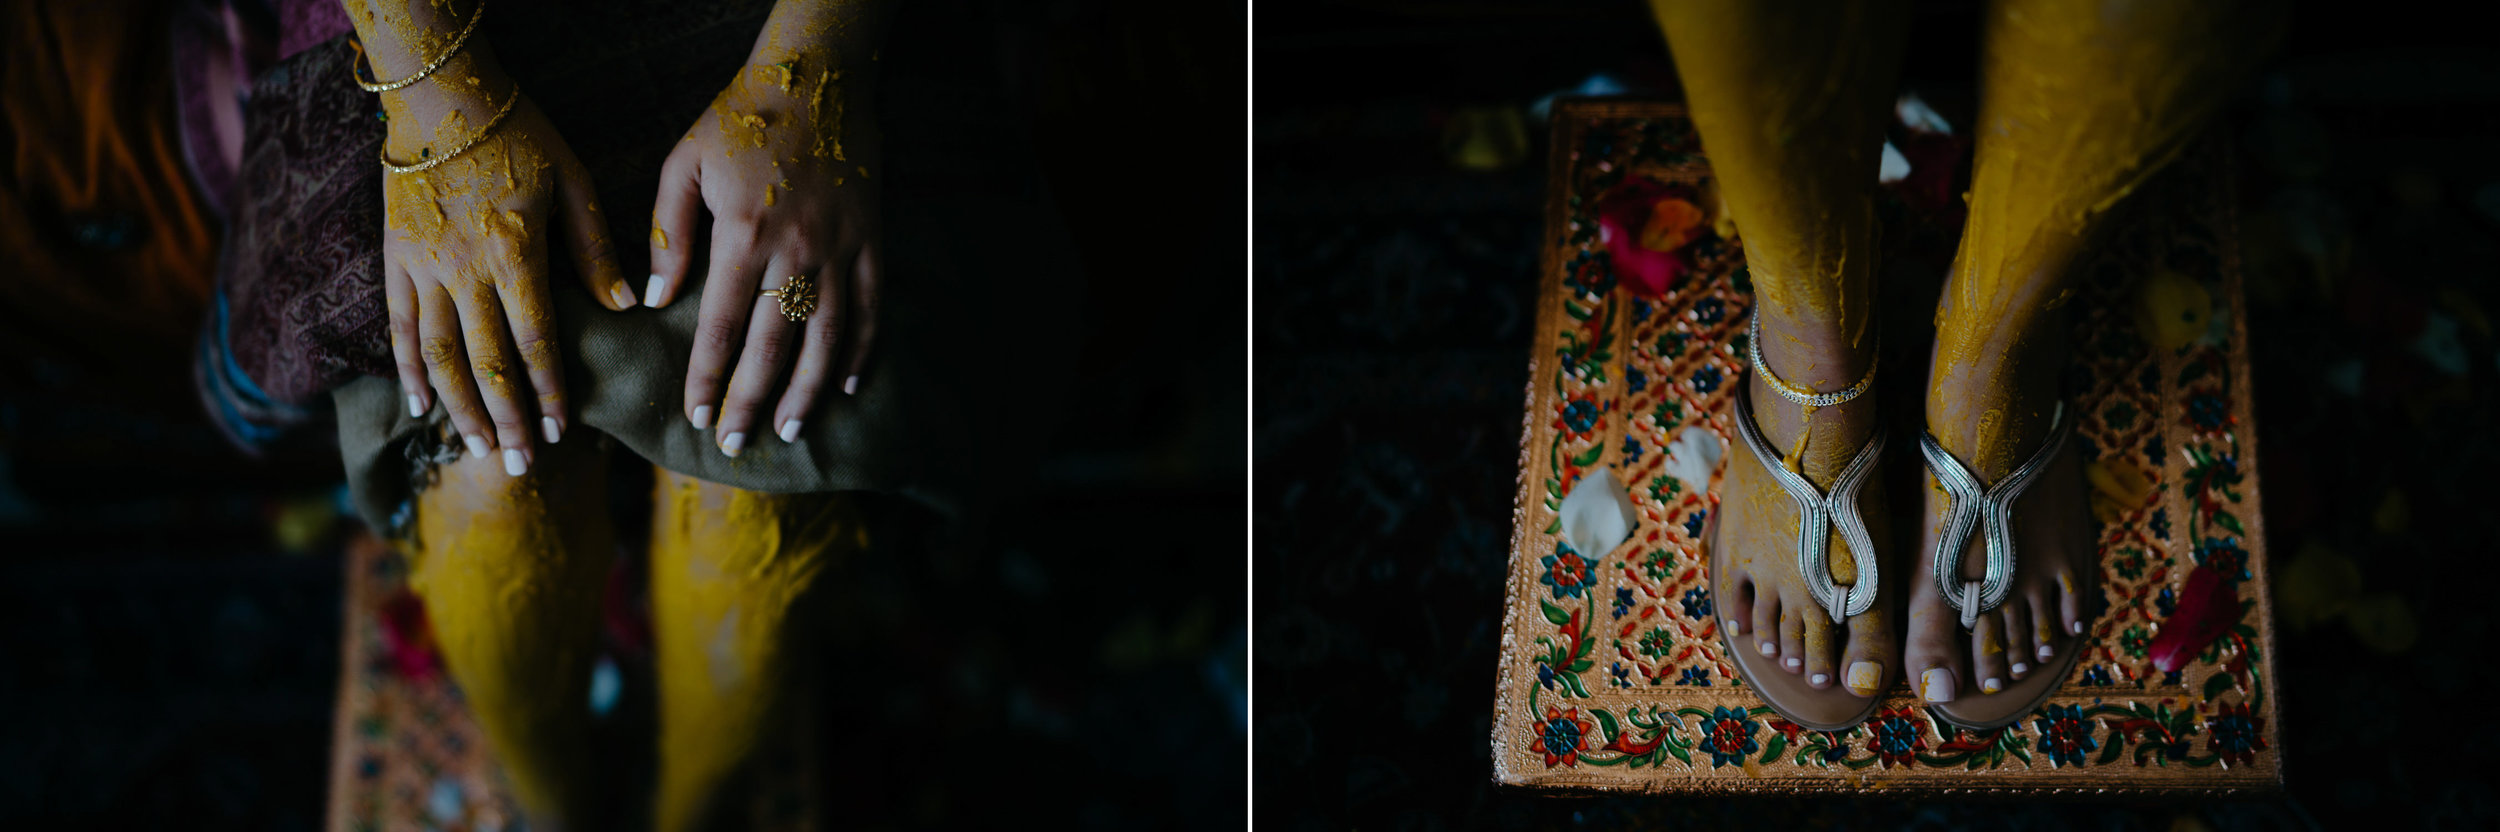 tanzania wedding rituals photography details paint